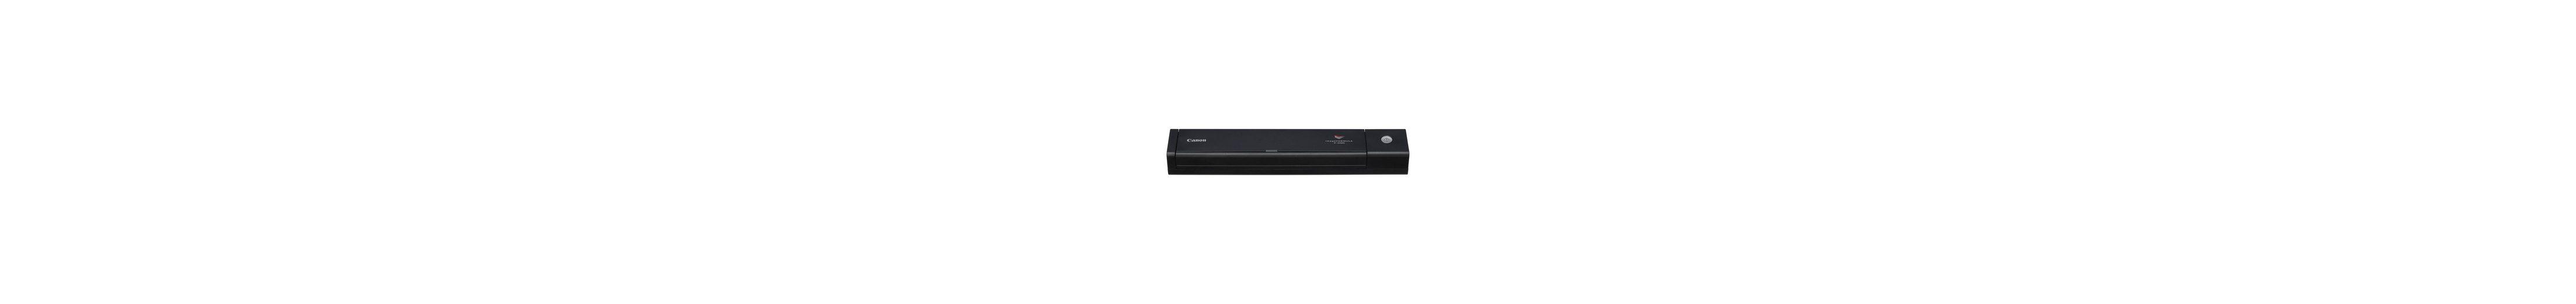 Canon Dokumentenscanner »P-208II USB 2.0«